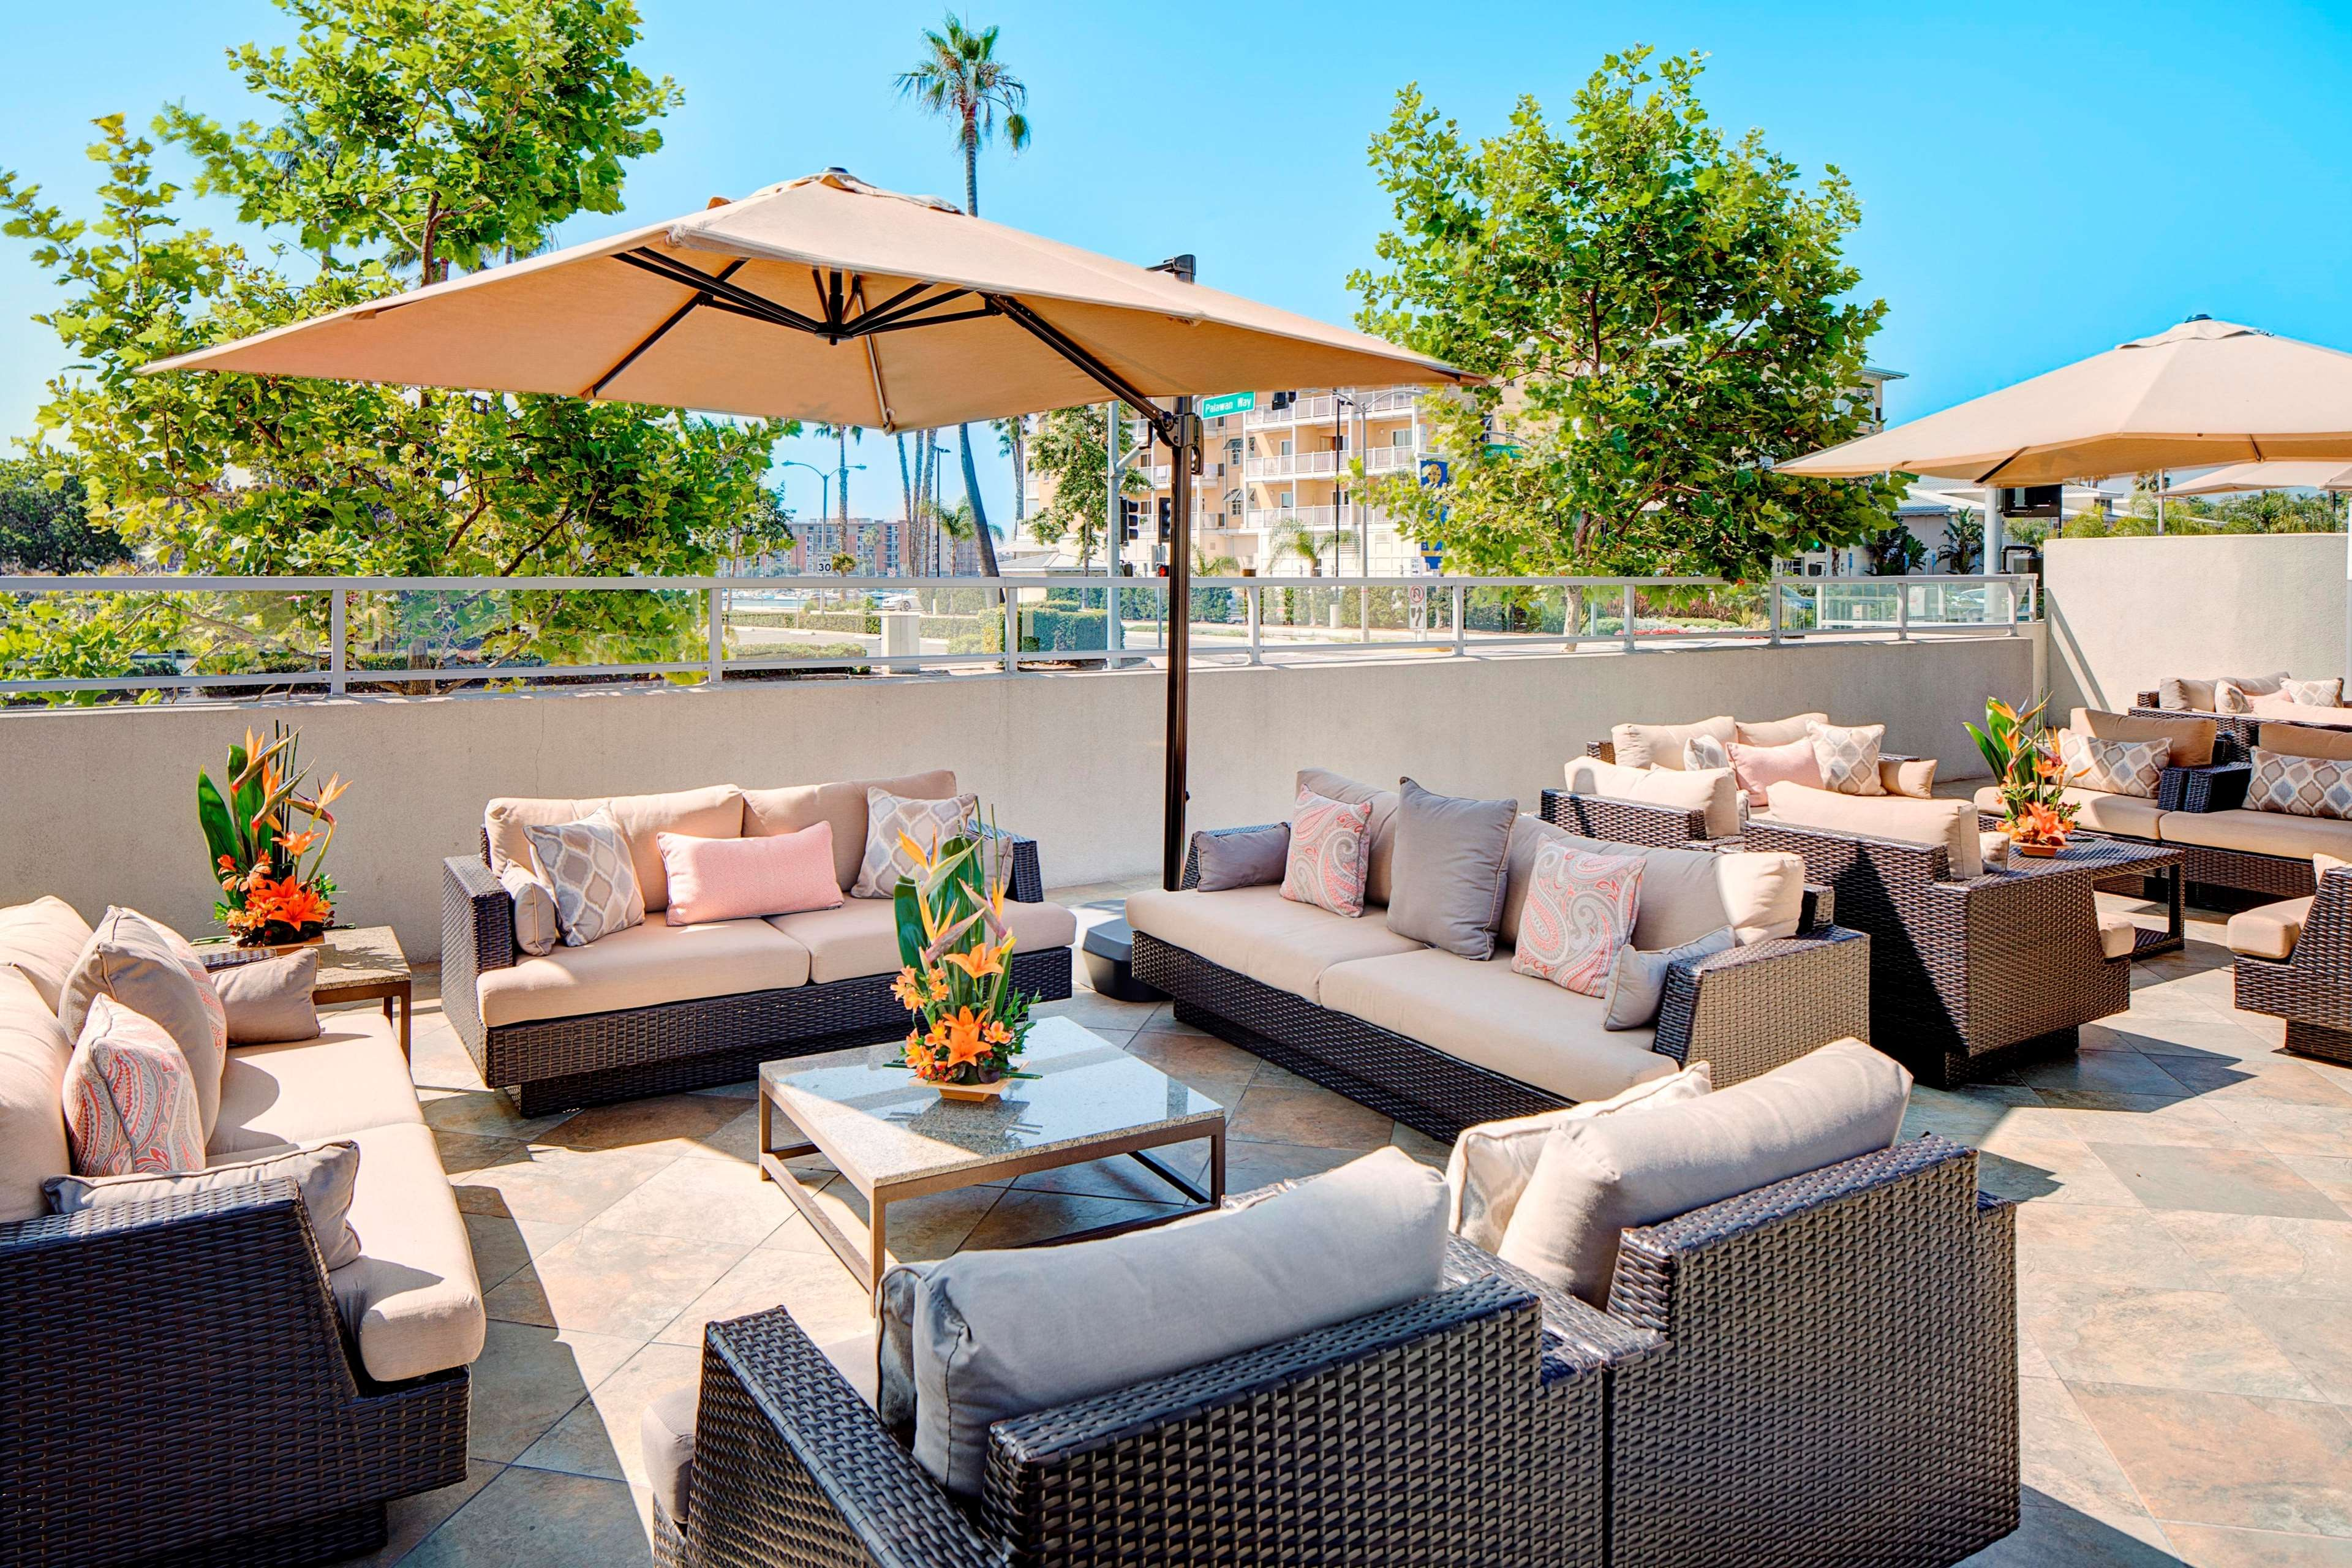 Hilton Garden Inn Los Angeles Marina Del Rey In Marina Del Rey Ca 90292